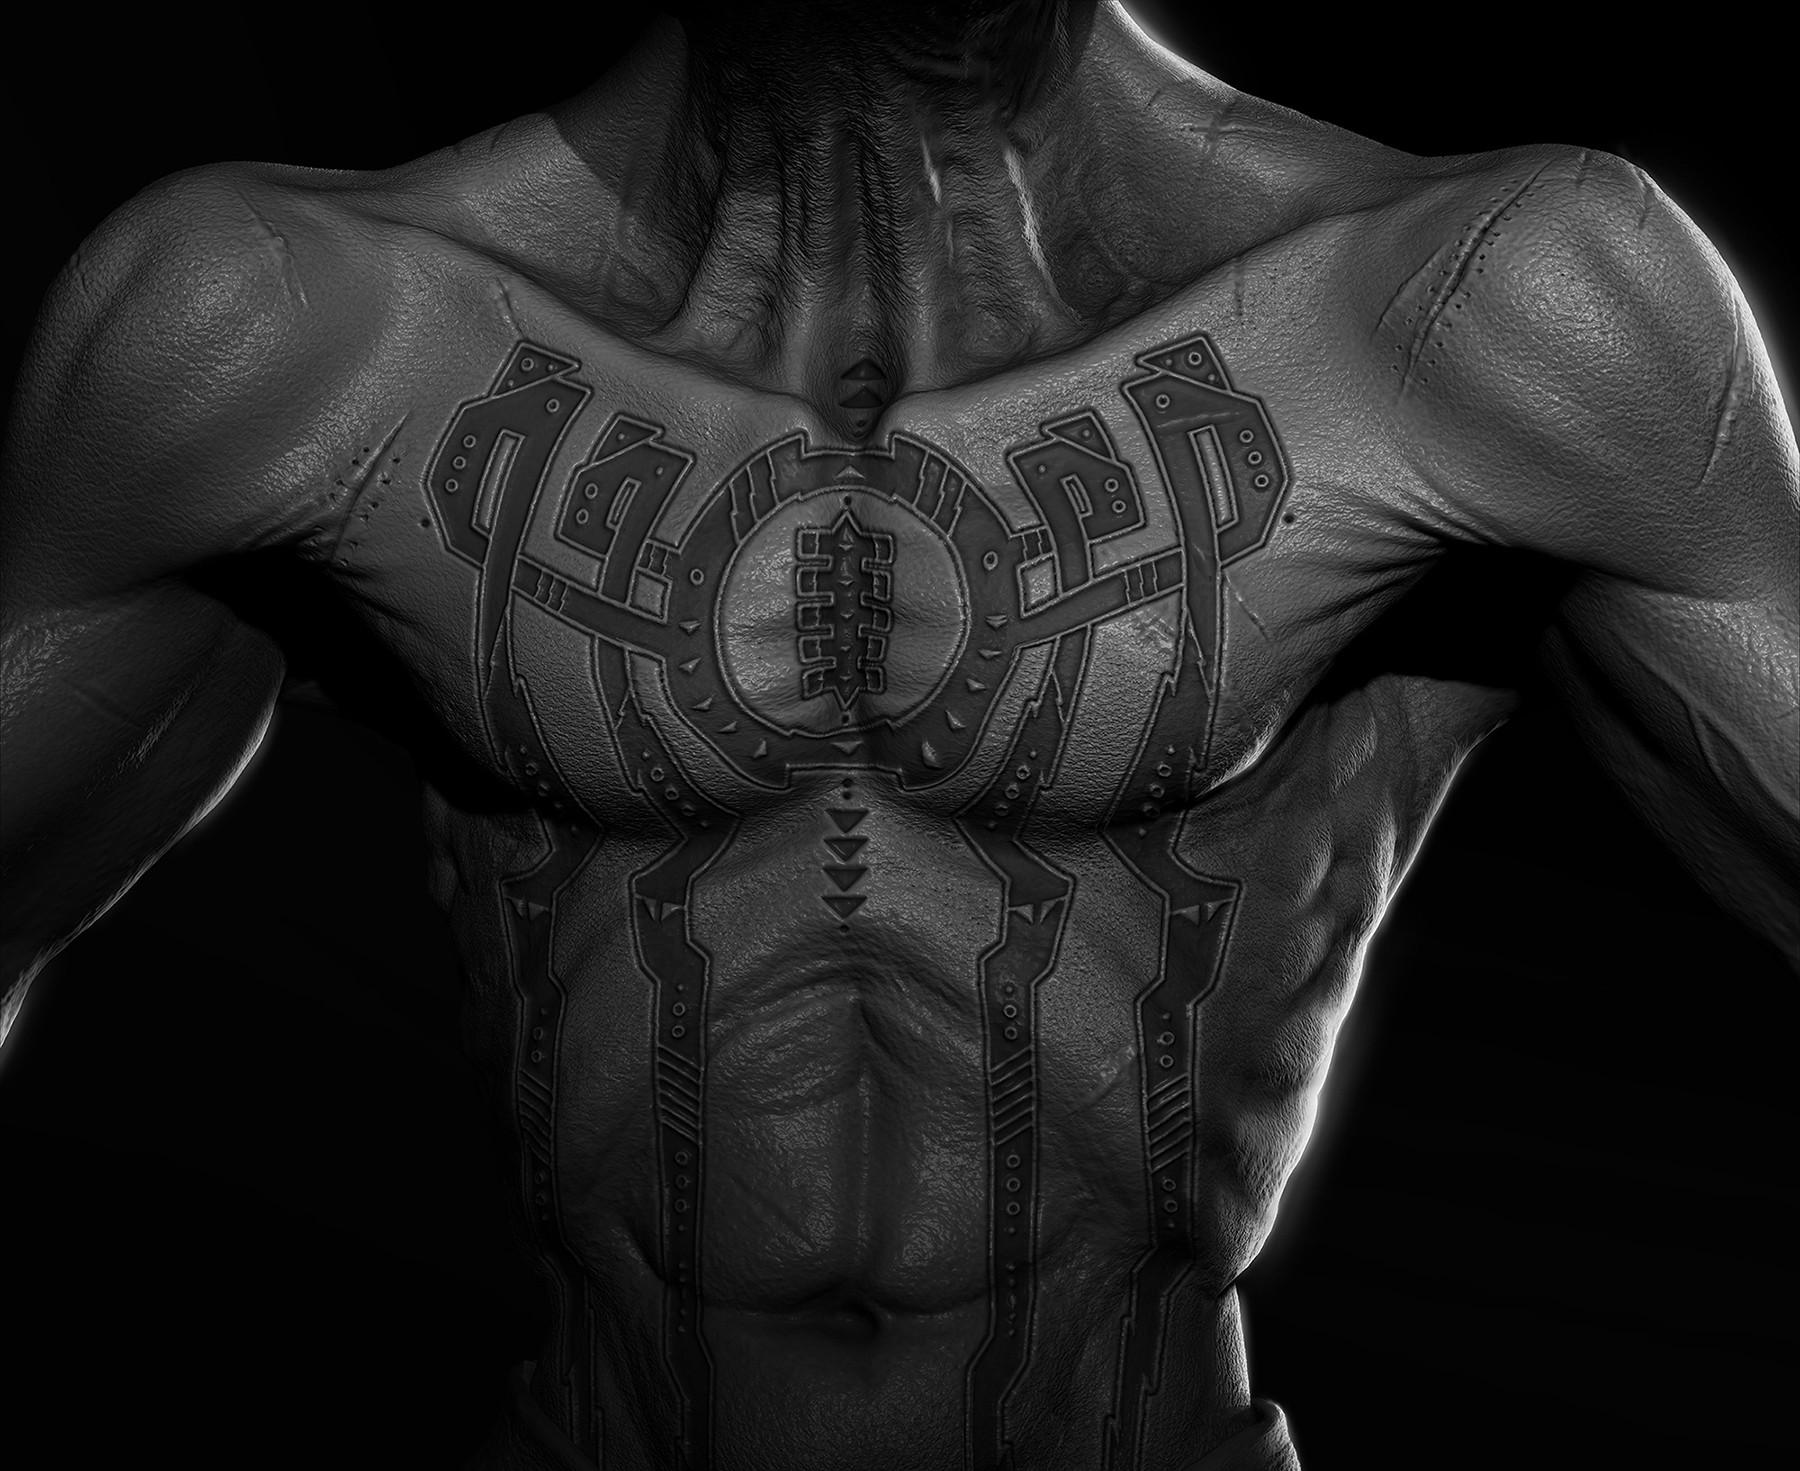 Guillaume lachance oddworld ss chest